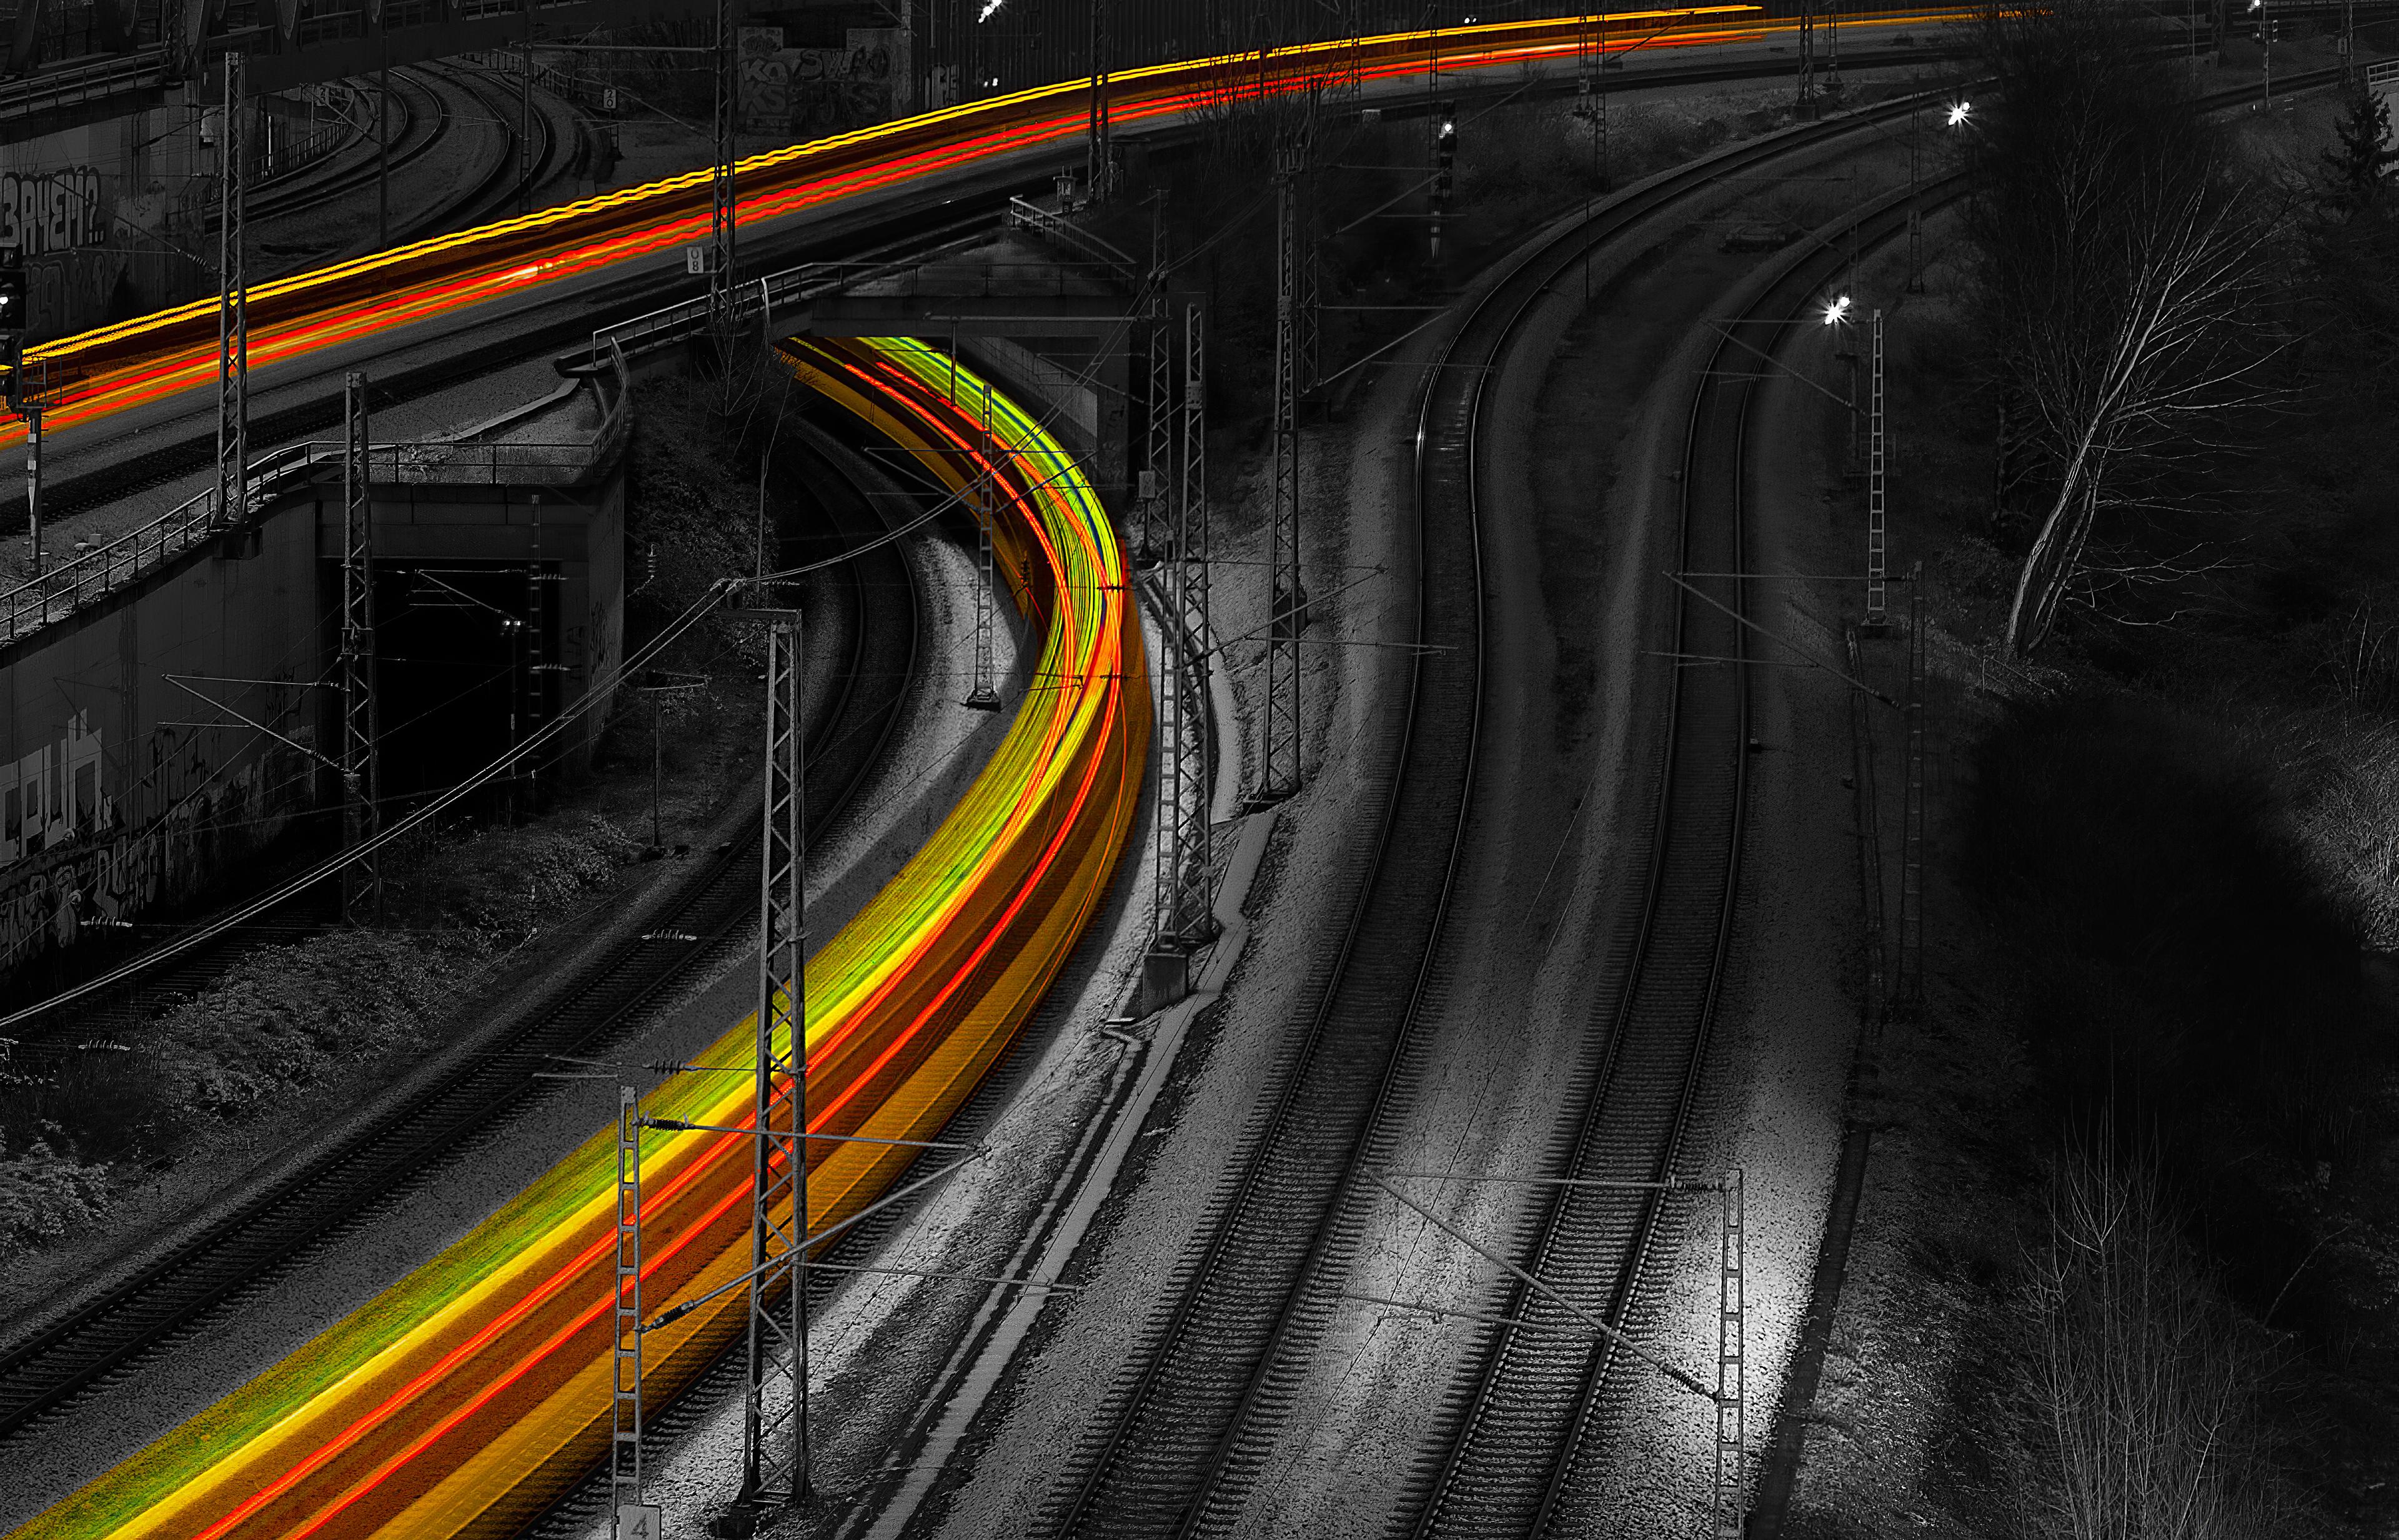 long exposure train tracks 1574938572 - Long Exposure Train Tracks -